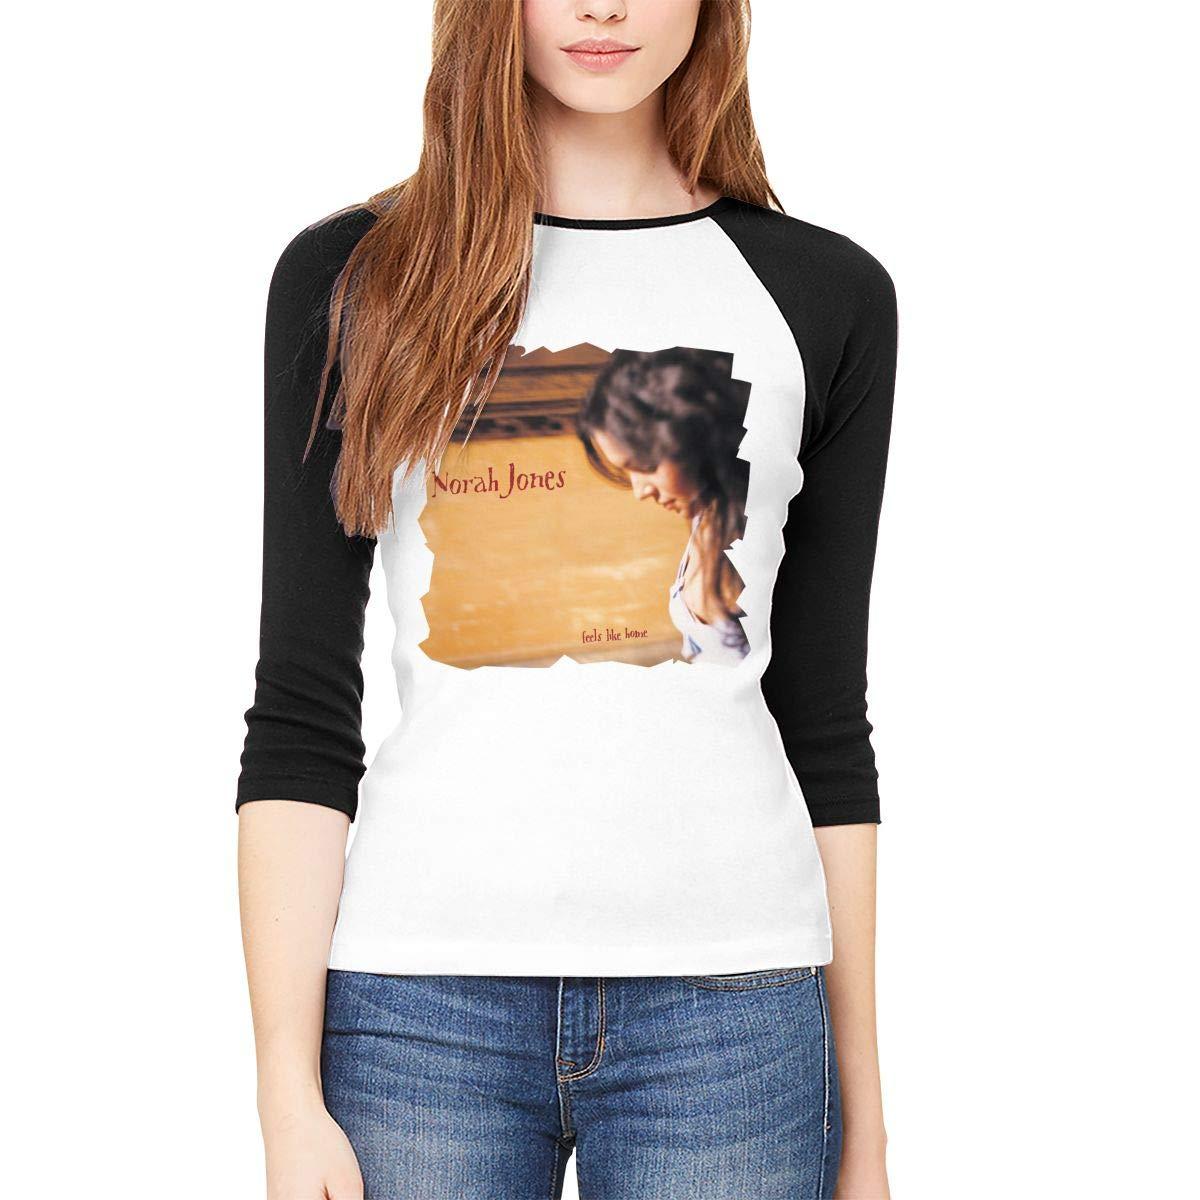 Norah Jones Feels Like Home 34 Sleeve Baseball T Shirt Raglan Tee Black